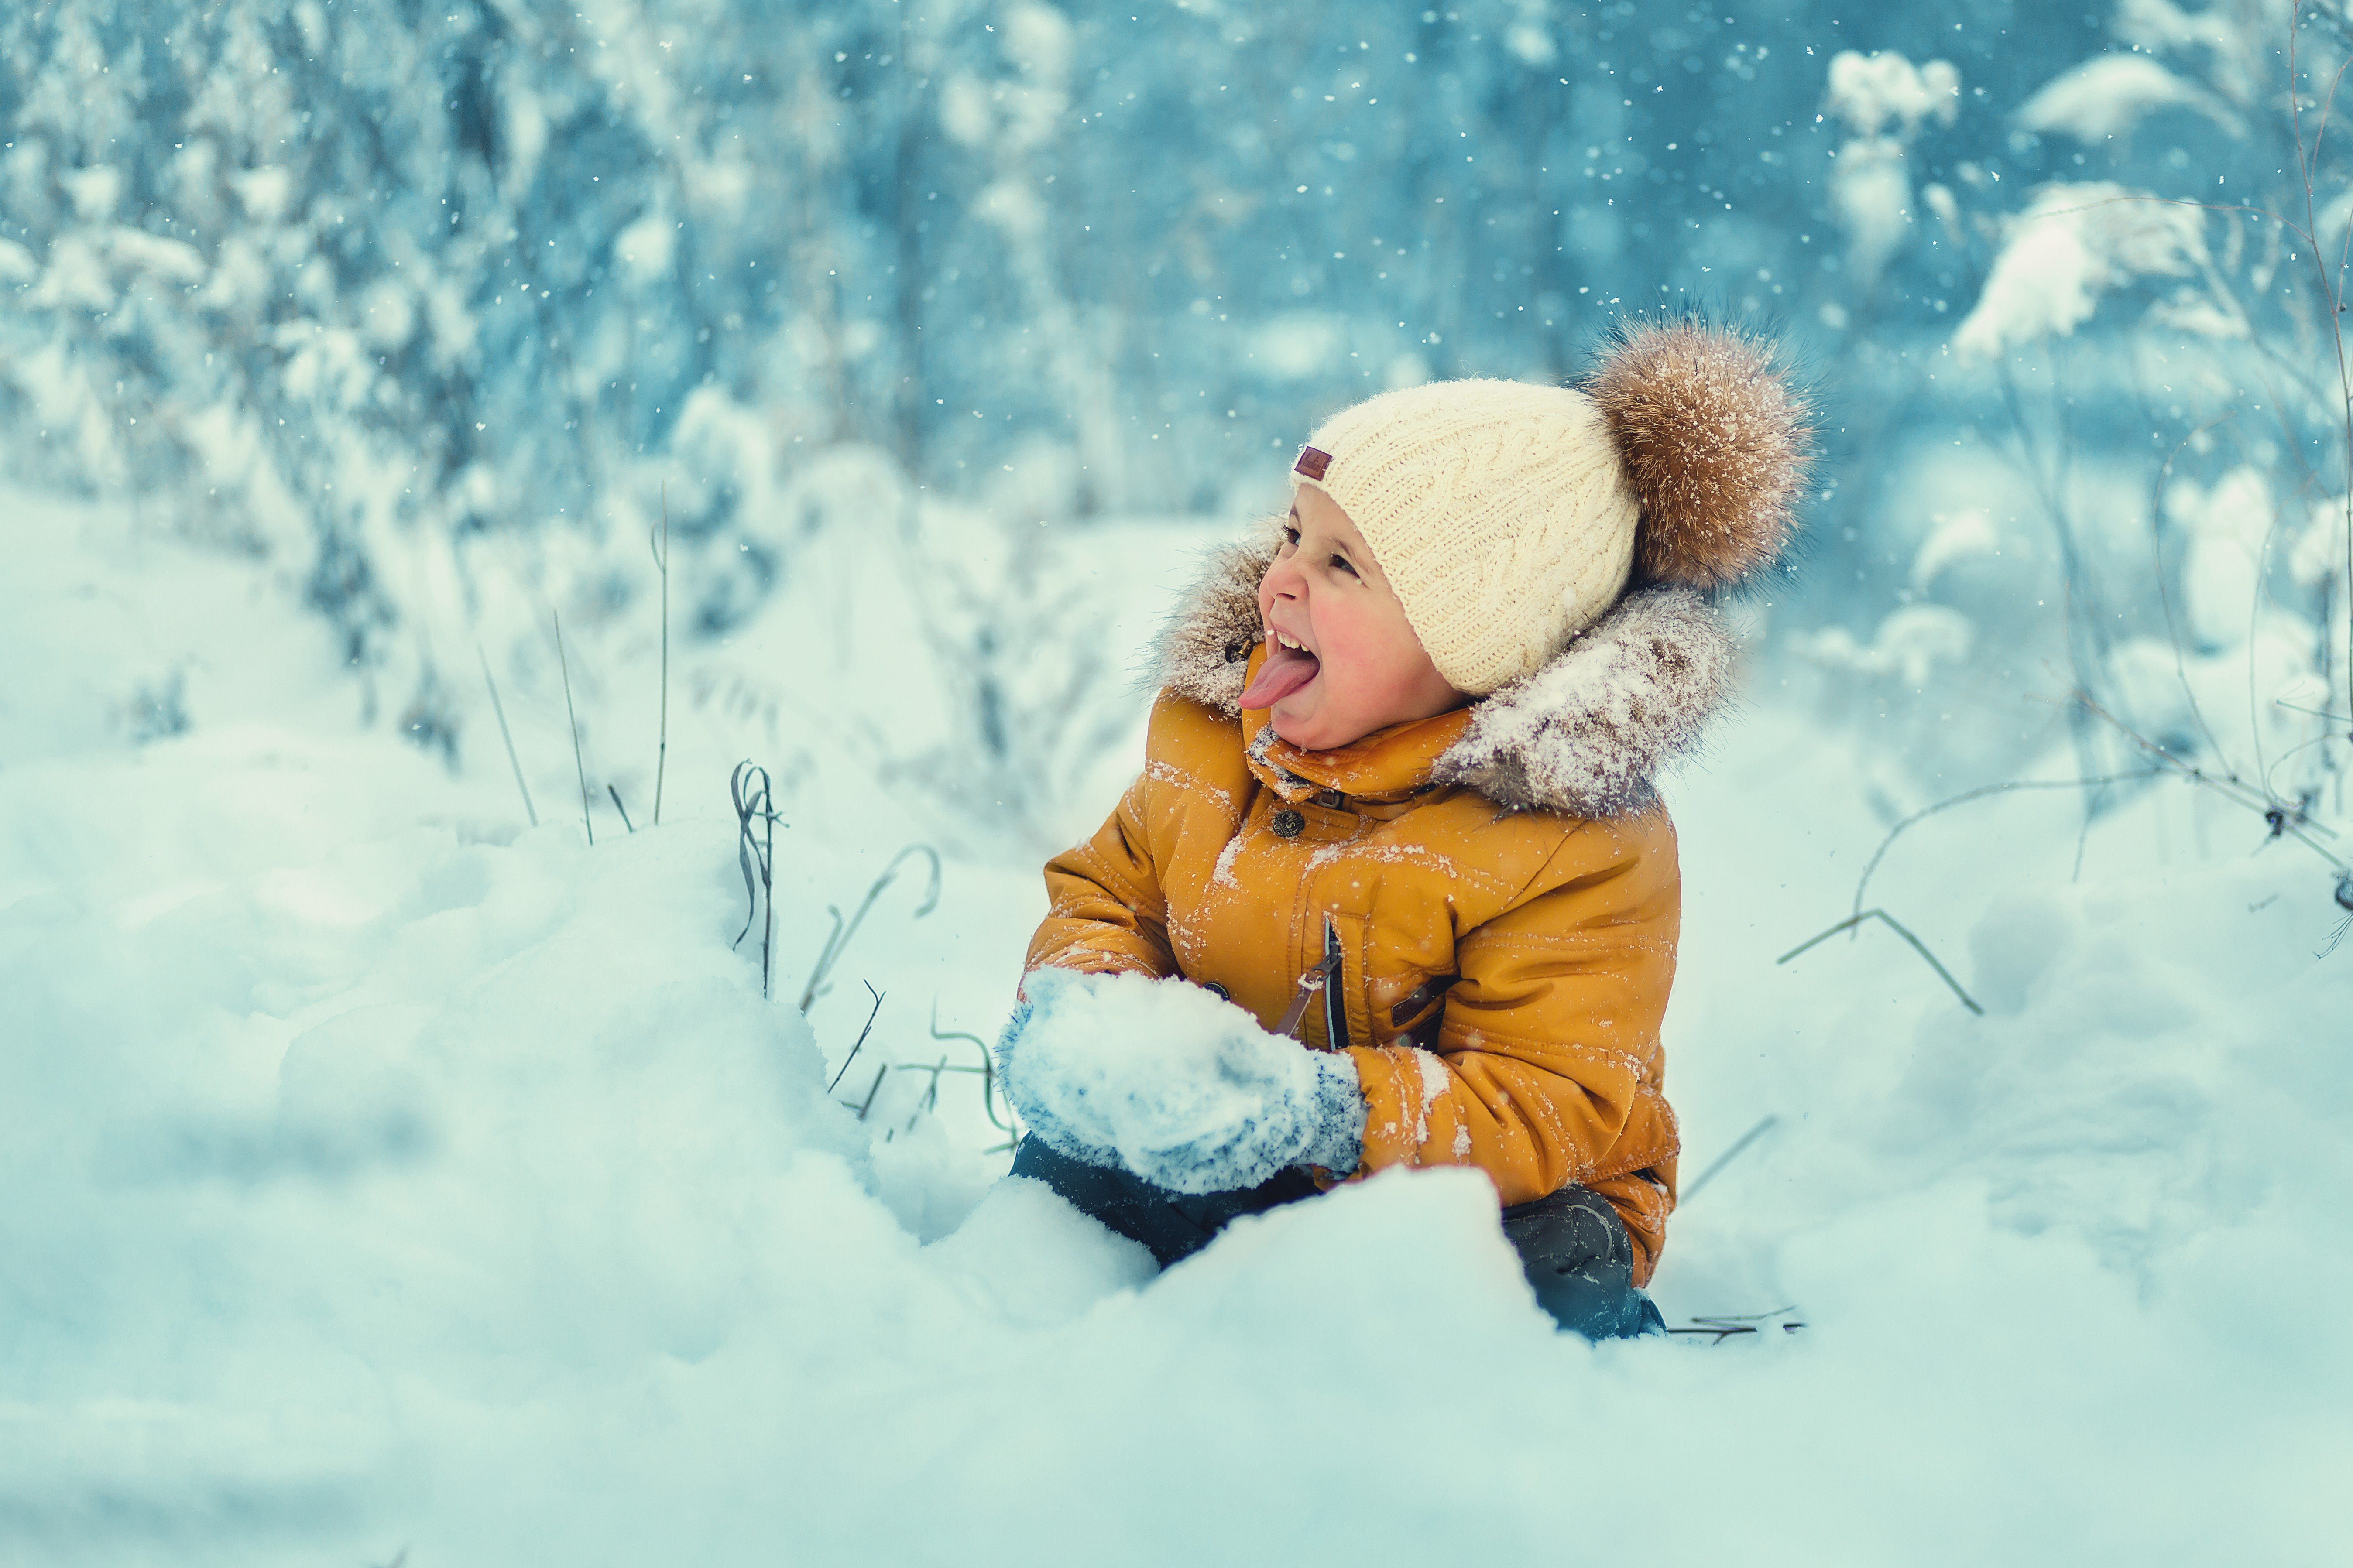 зима, дети, снег,, Алена Пайвина